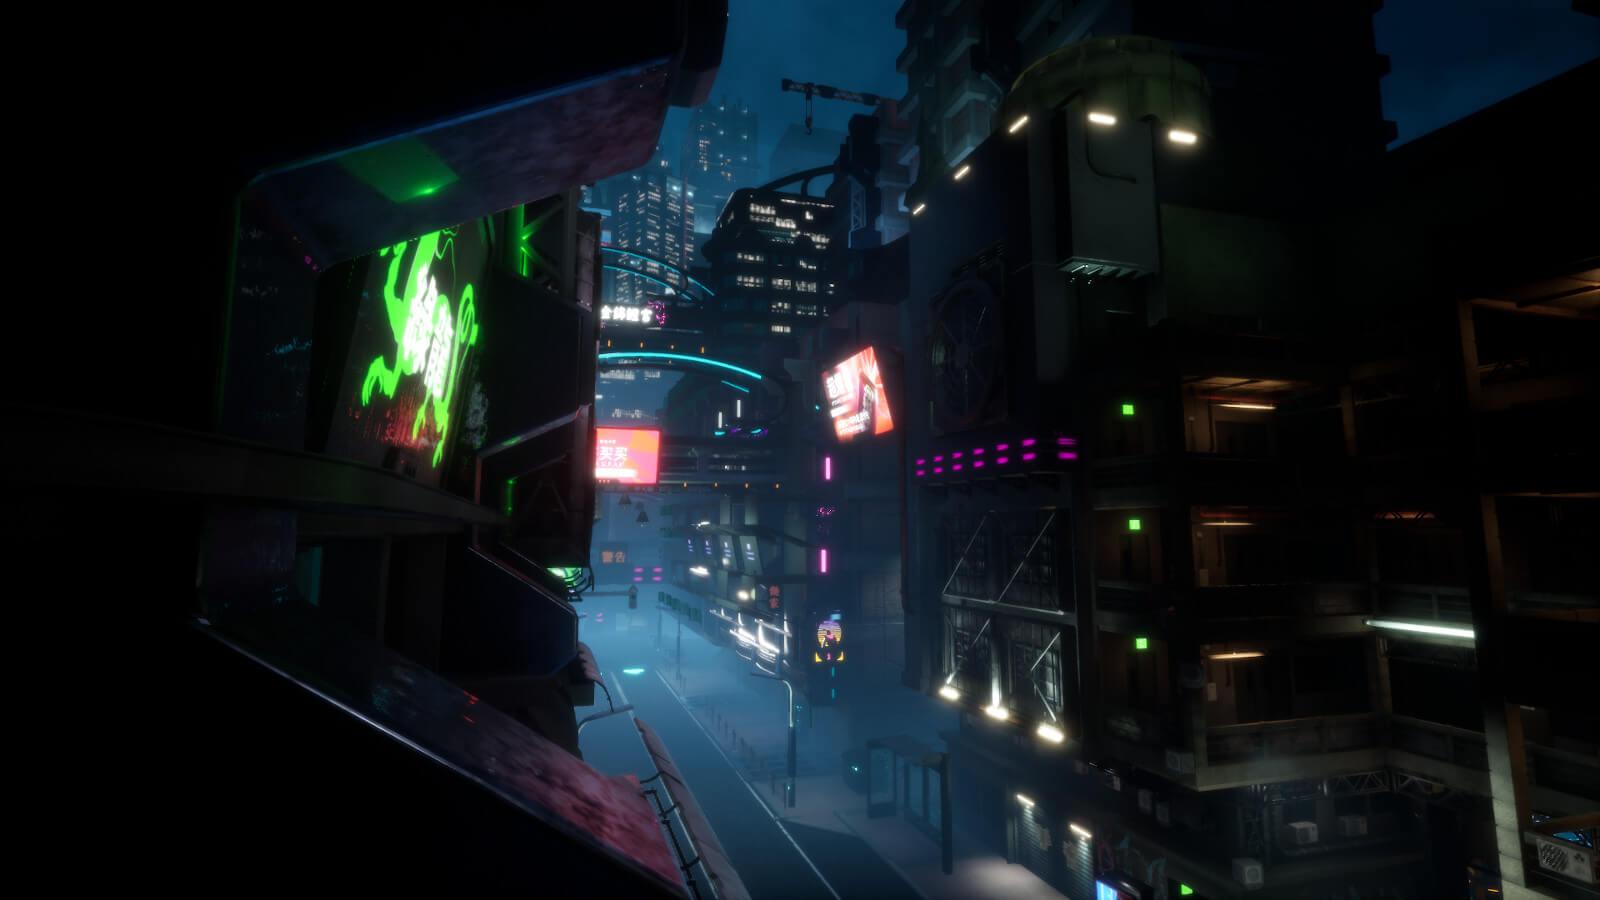 Futuristic city street at night